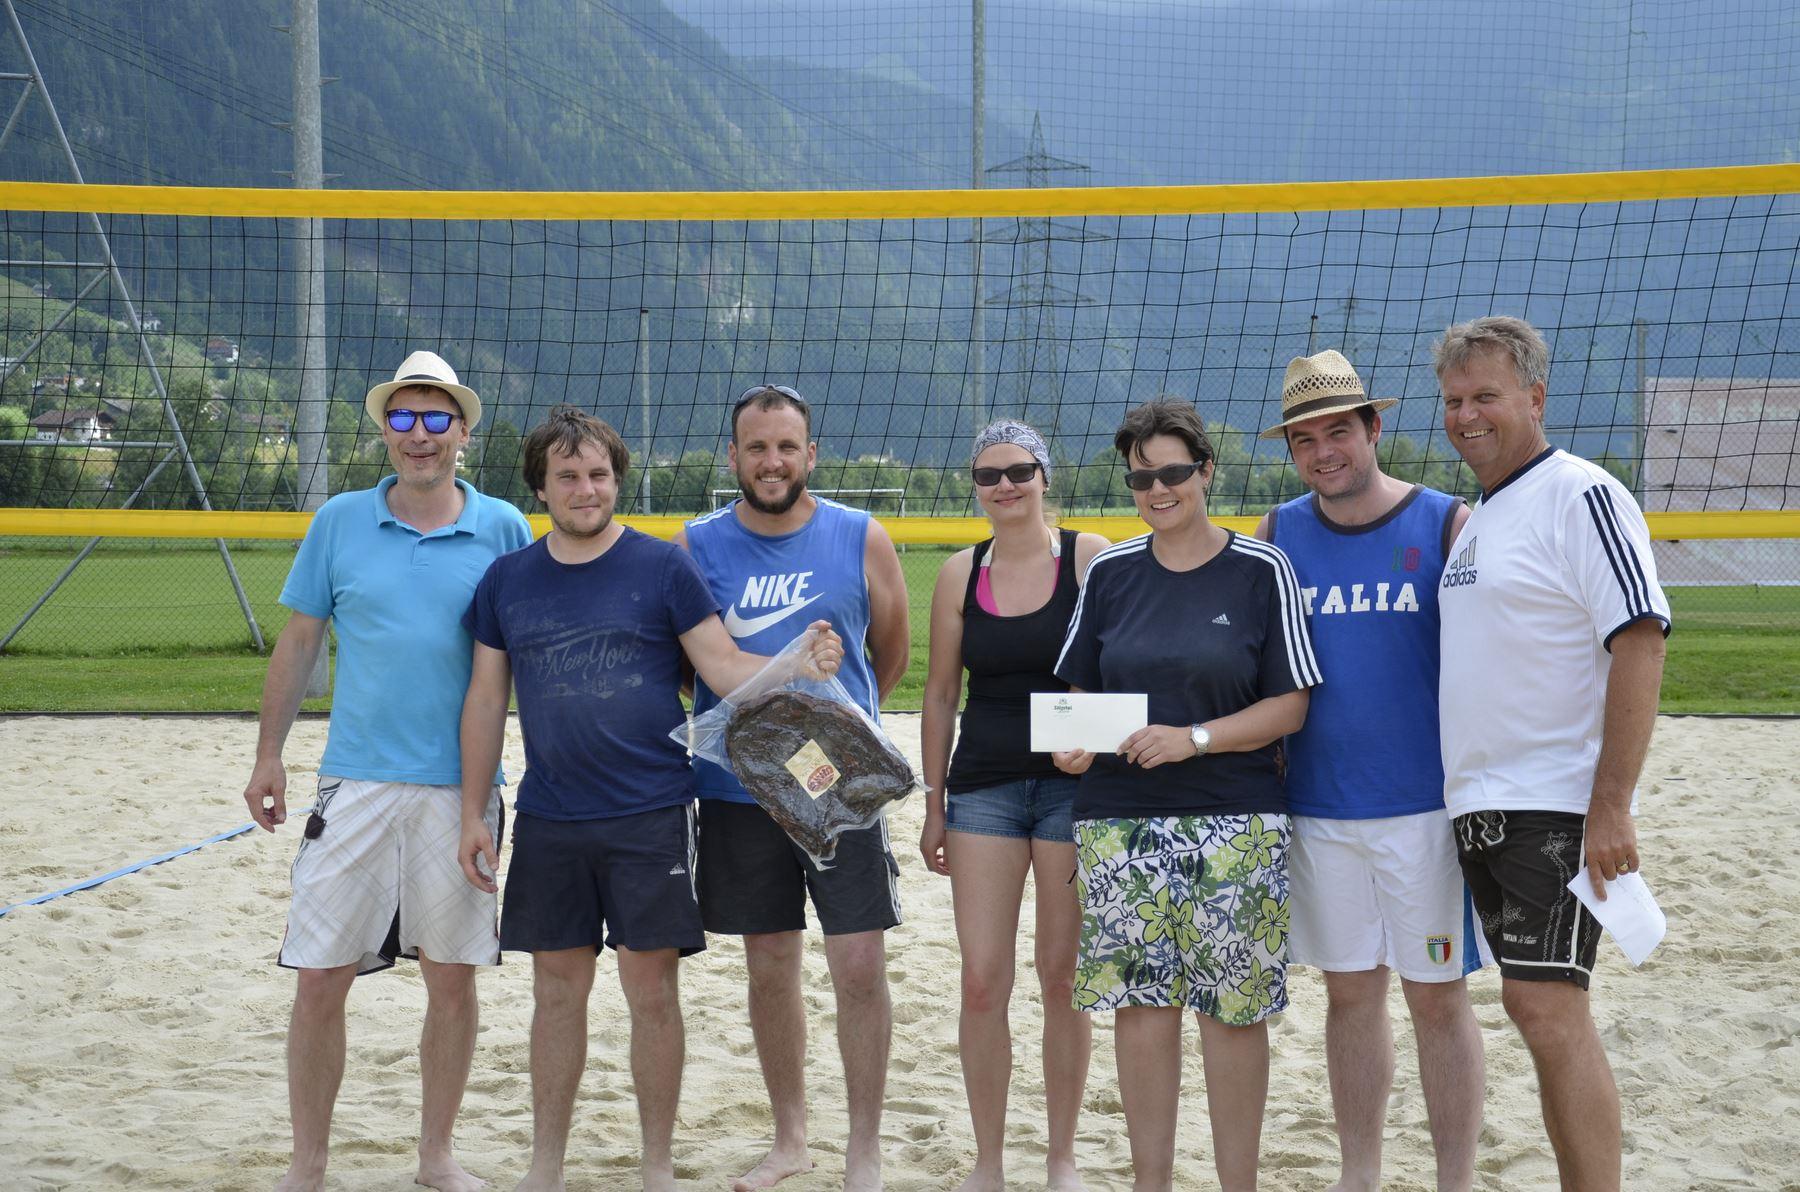 2016-07-02 Beachvolleyball 299